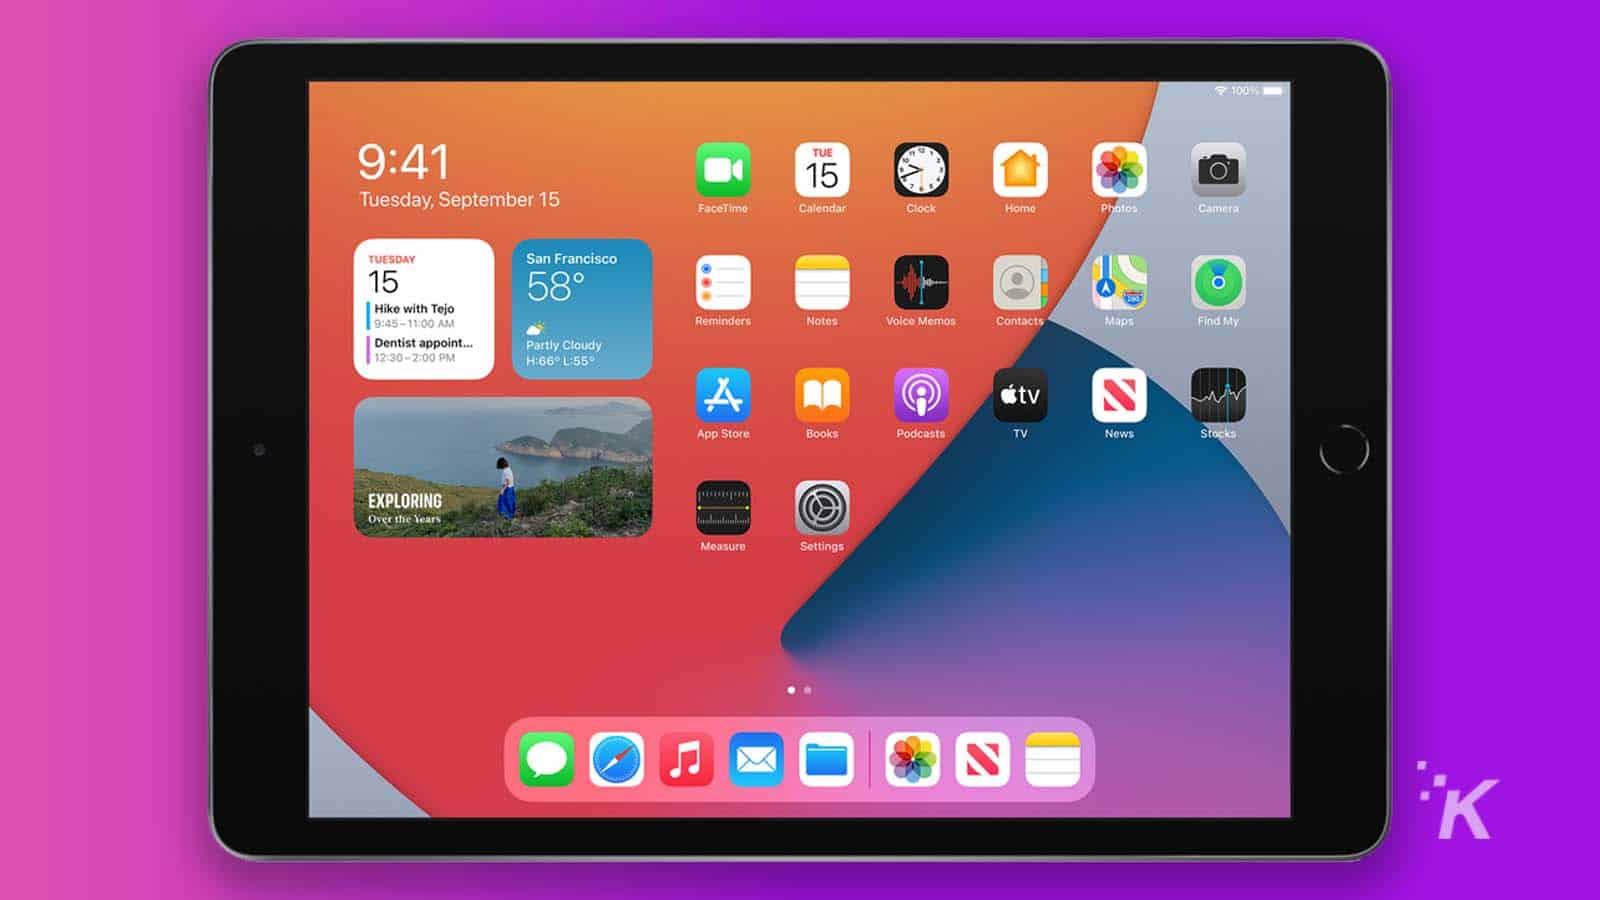 8th generation apple ipad on purple background